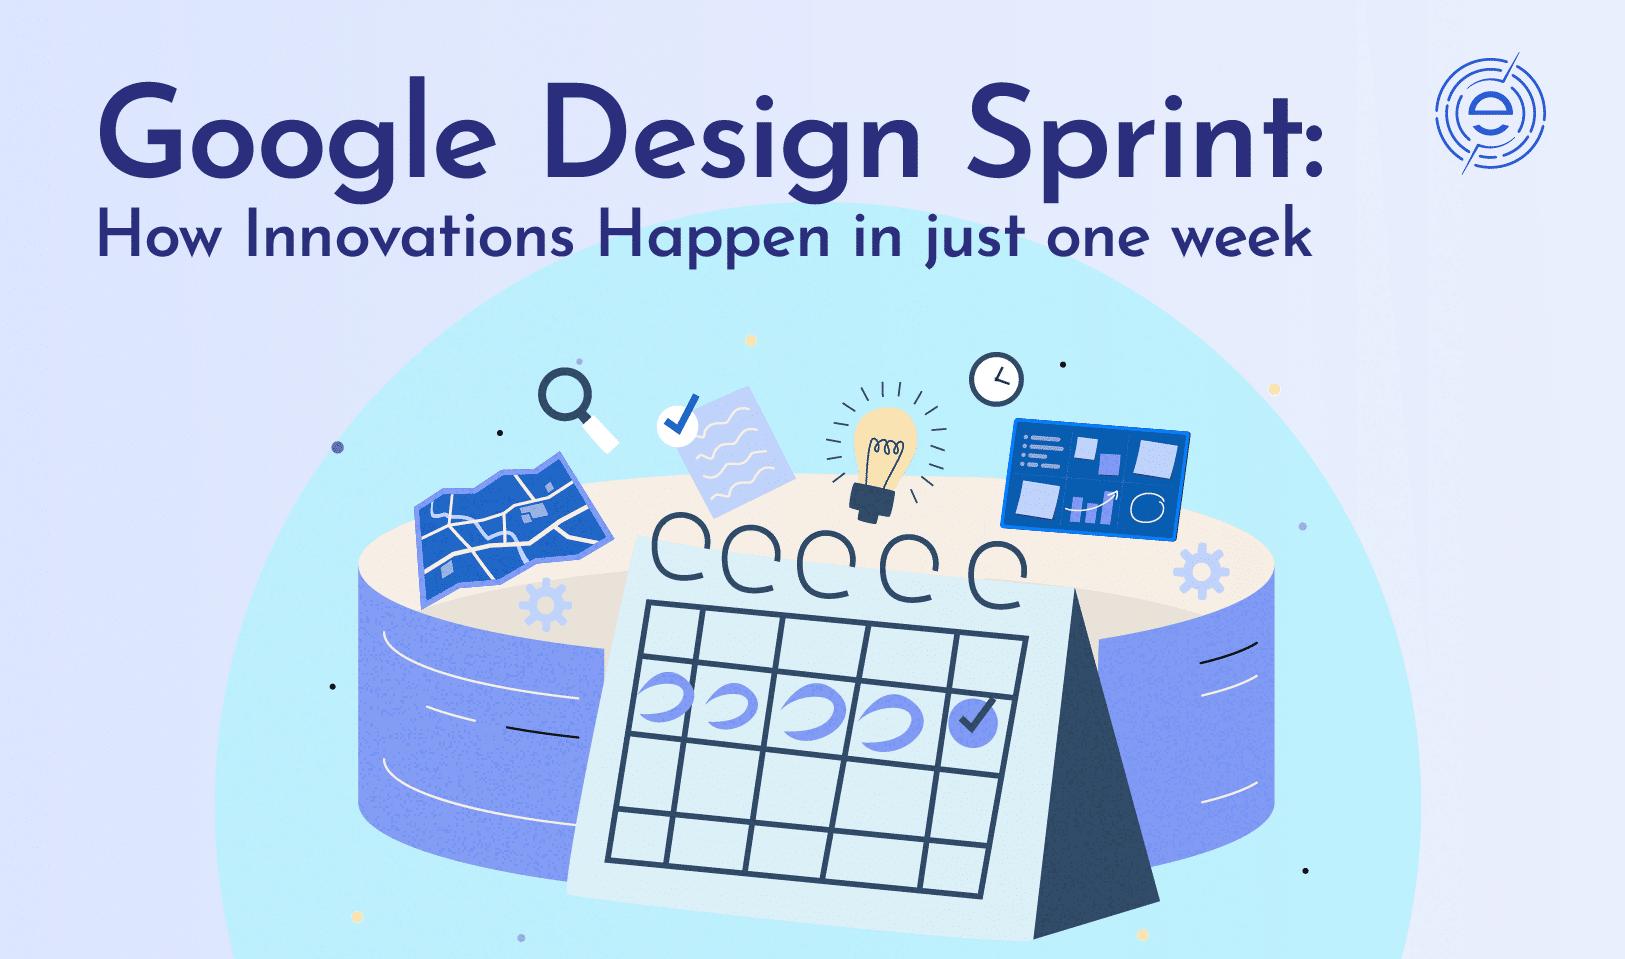 Google Design Sprint